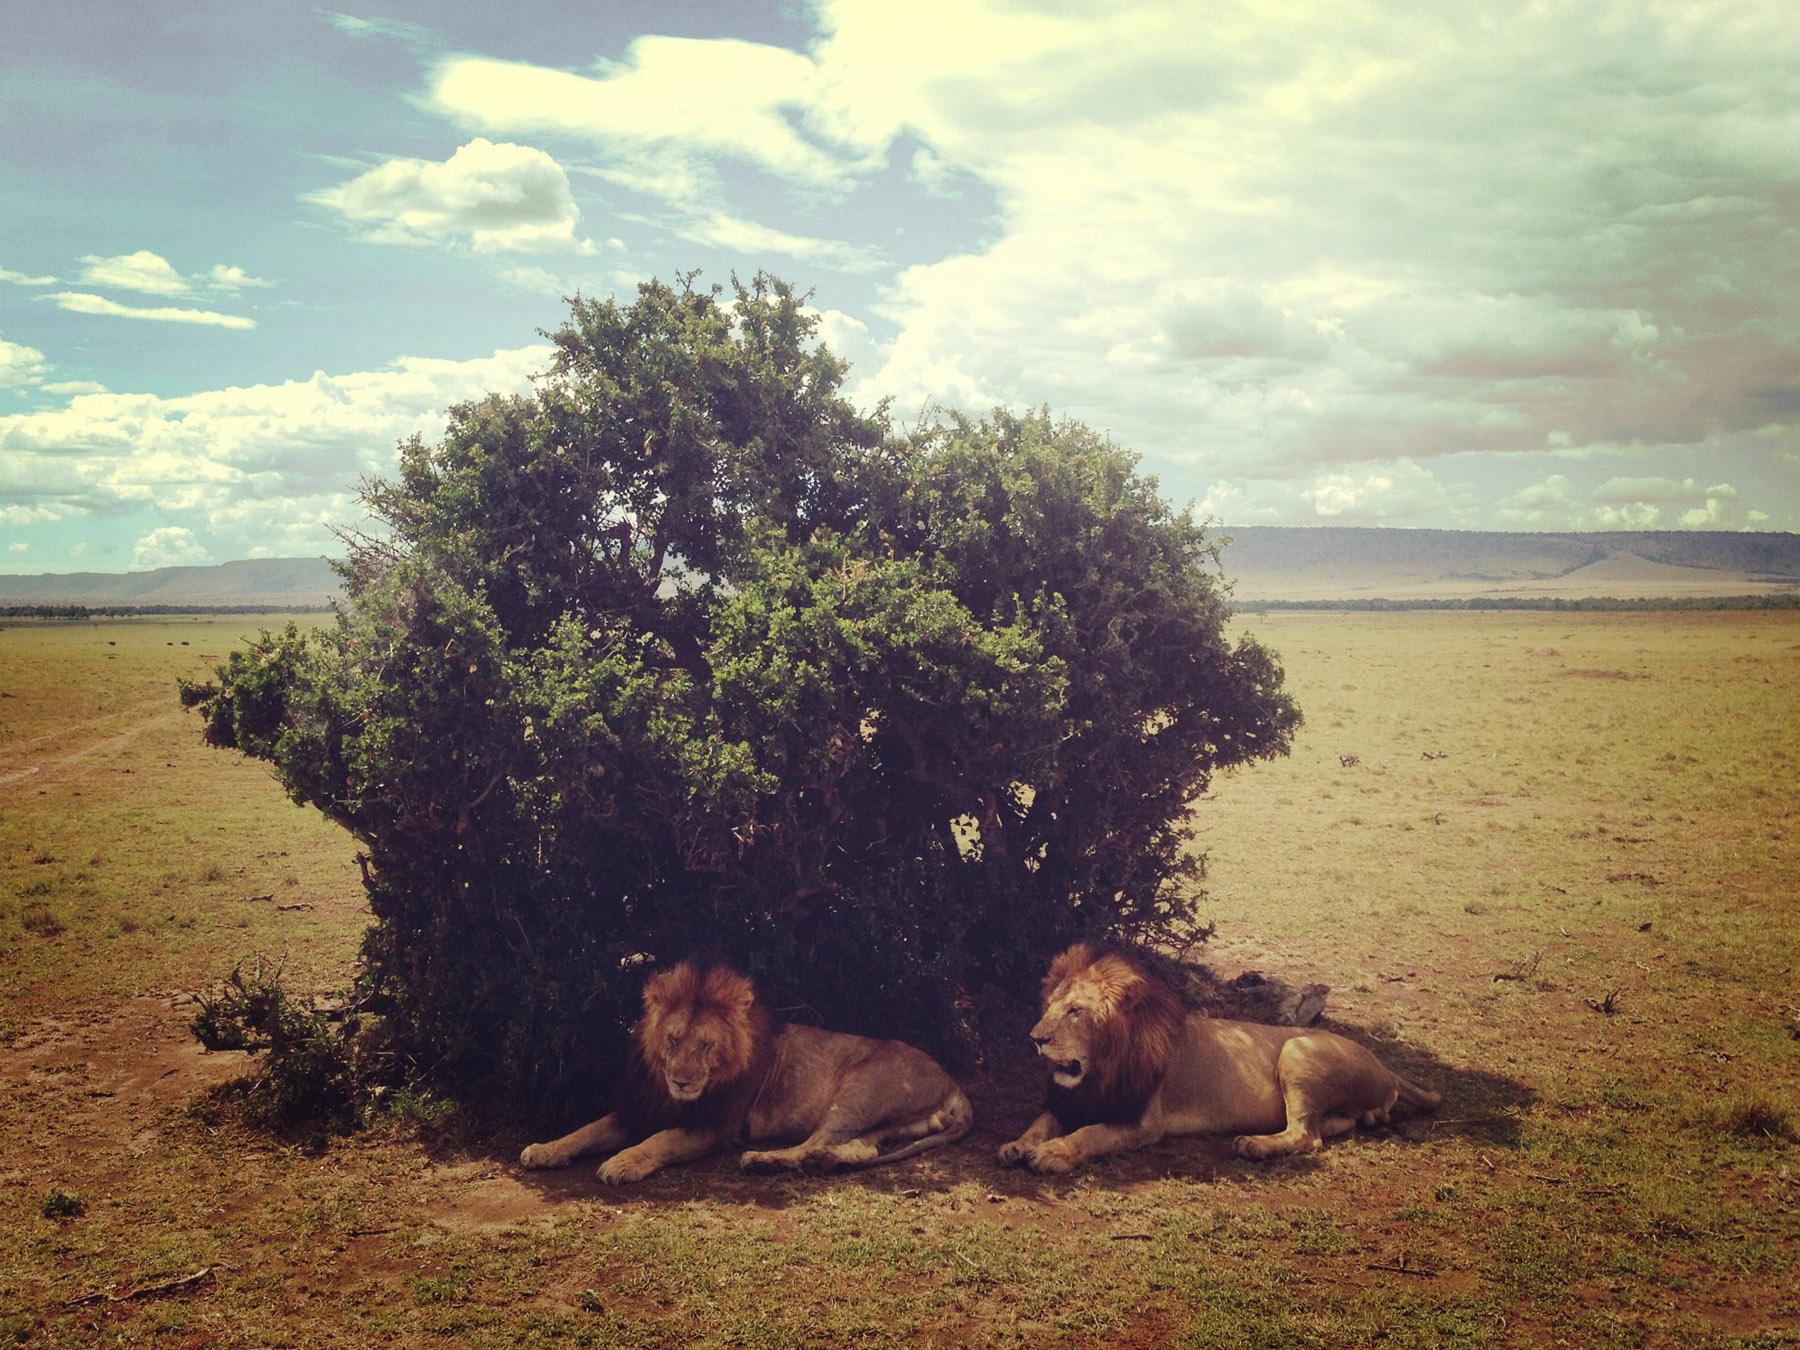 Mara_lionbrothers3.jpg